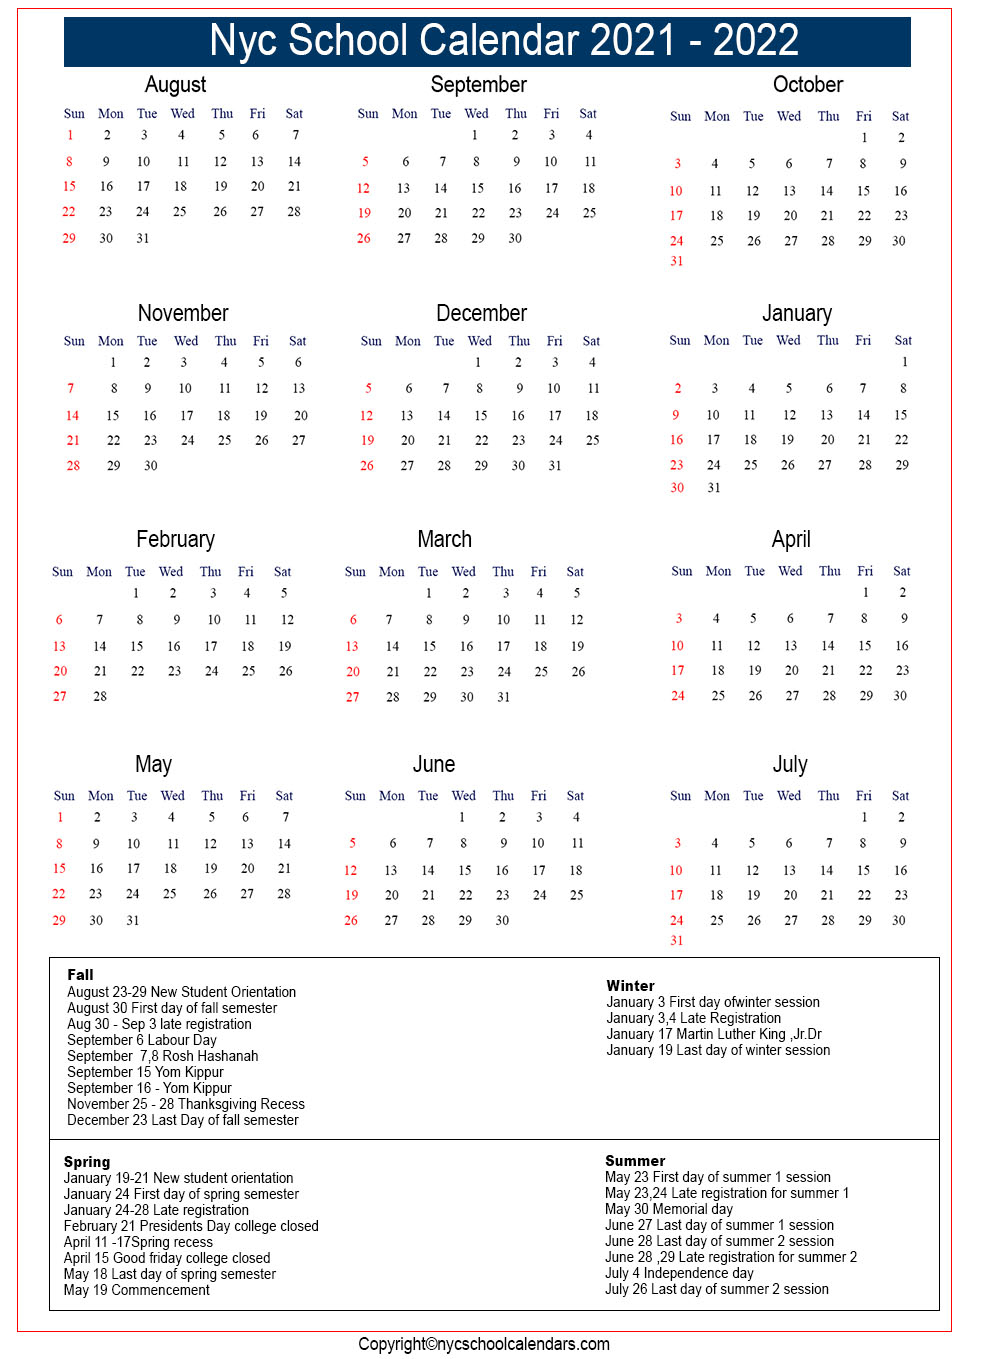 Nyc School Calendar 2021 ✅❤️ With Regard To Niagara Falls School Calendar 2021